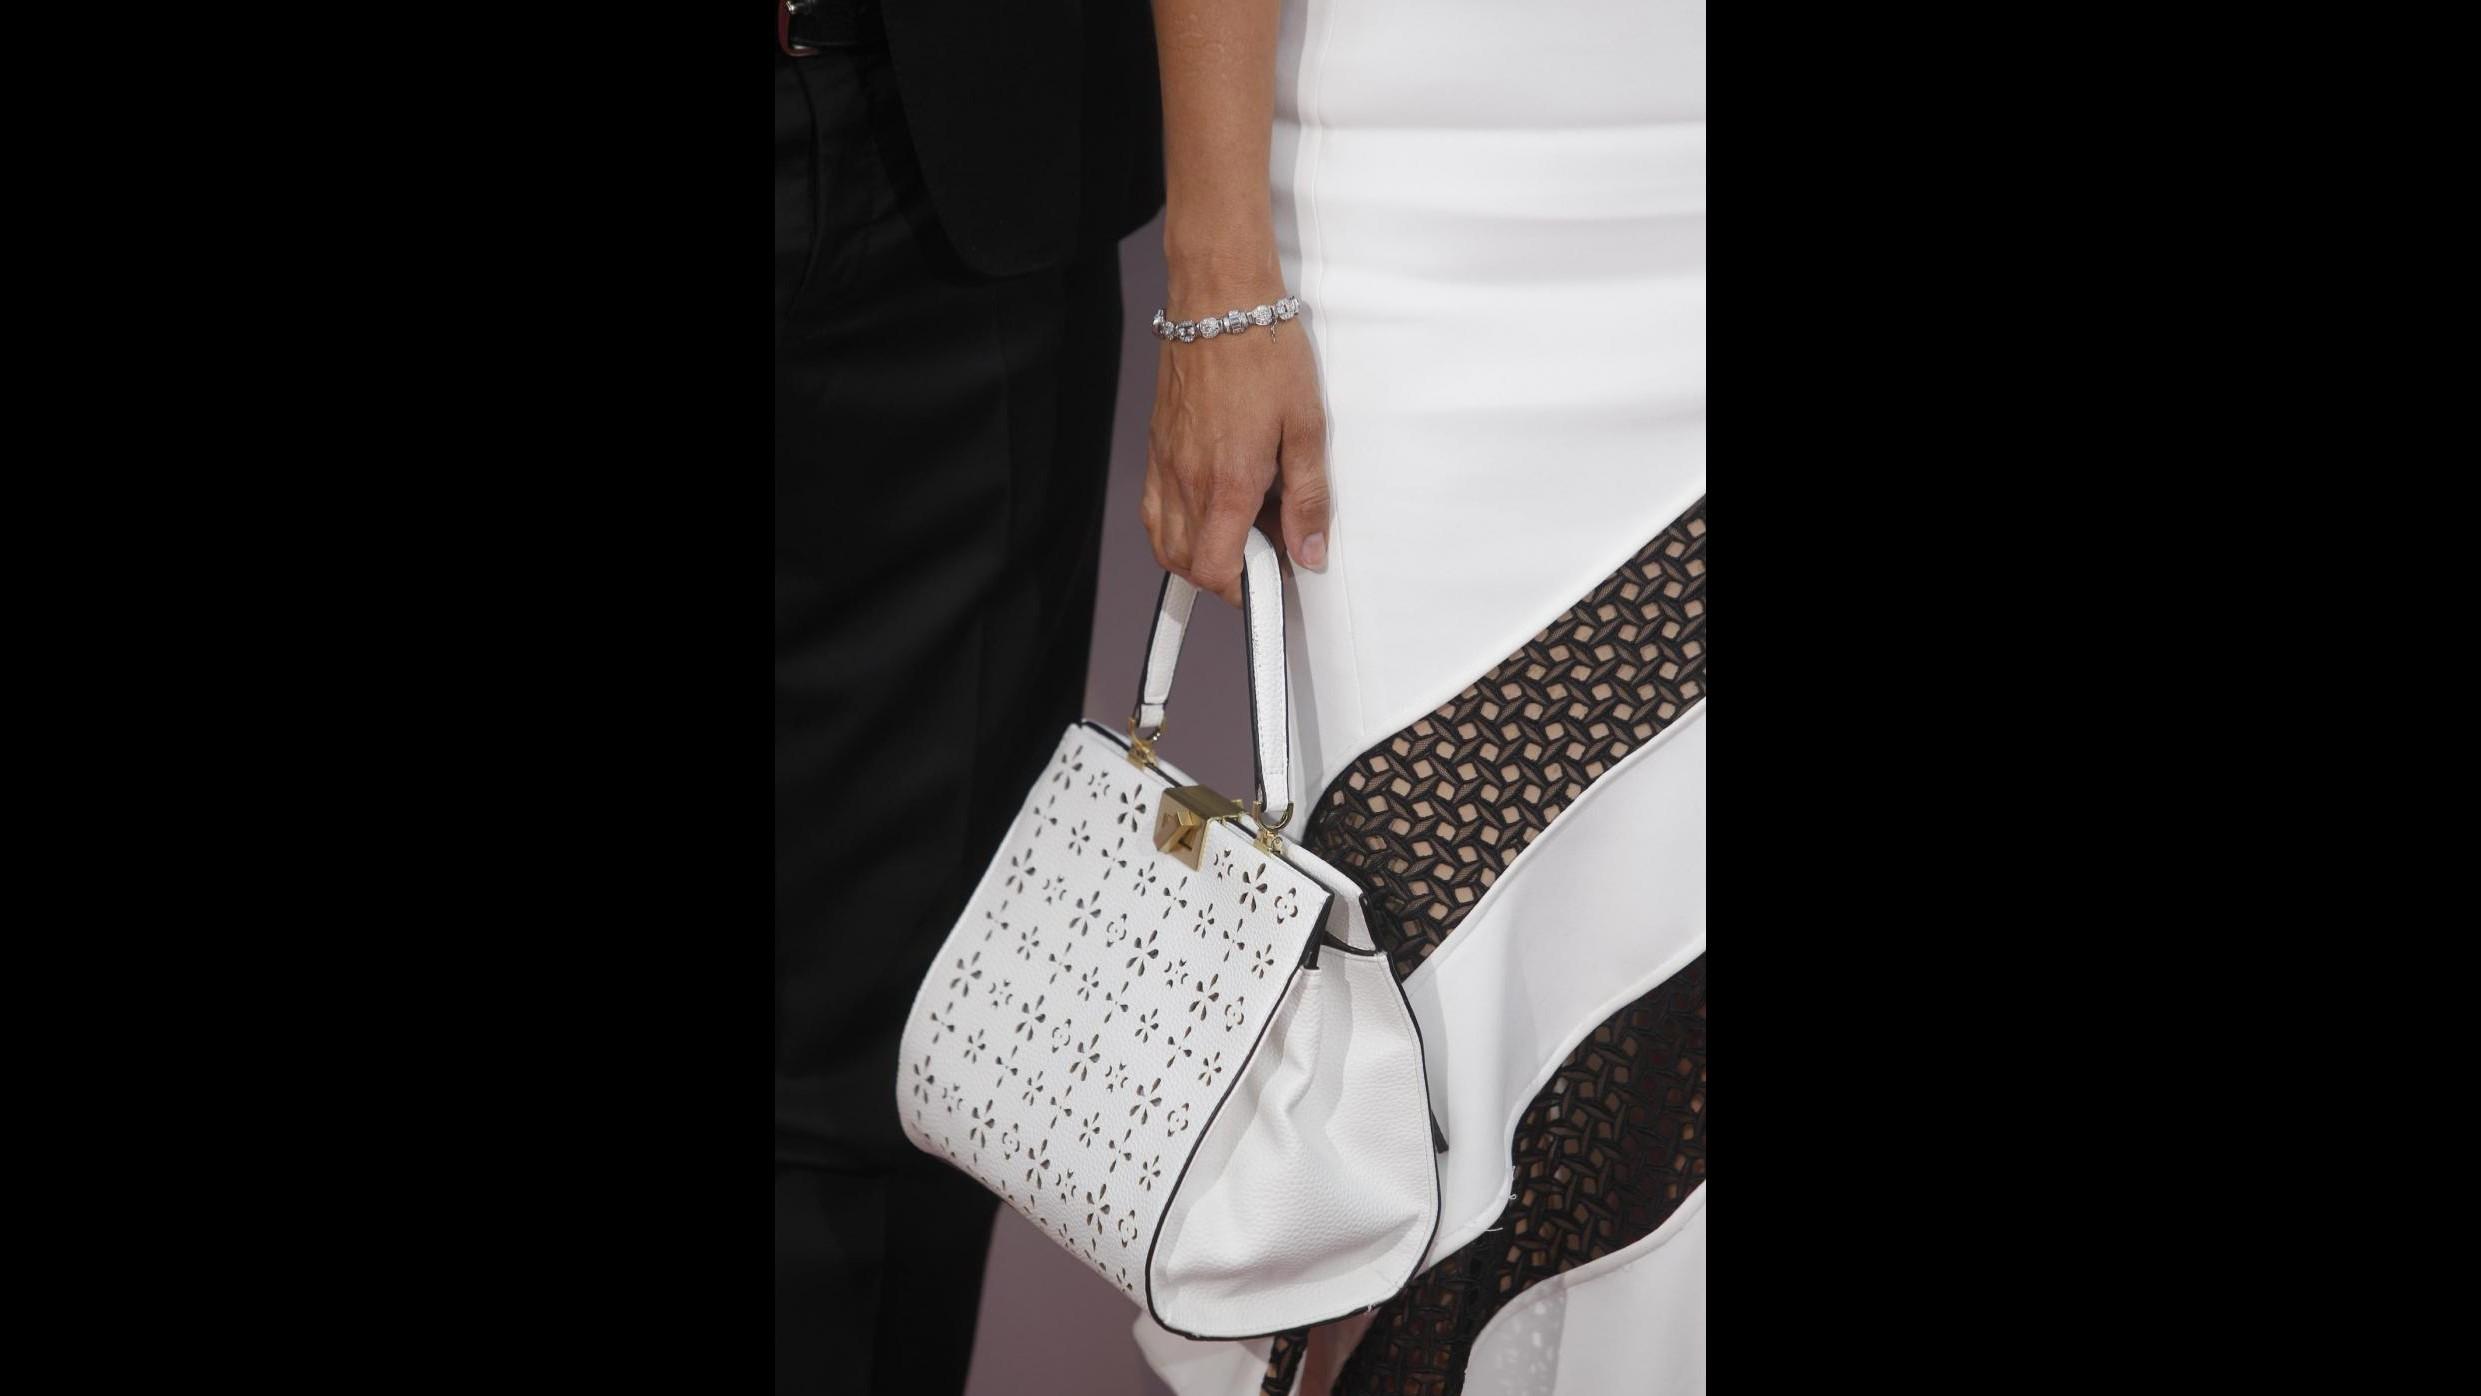 FOTO Penelope Cruz elegantissima in bianco a Madrid